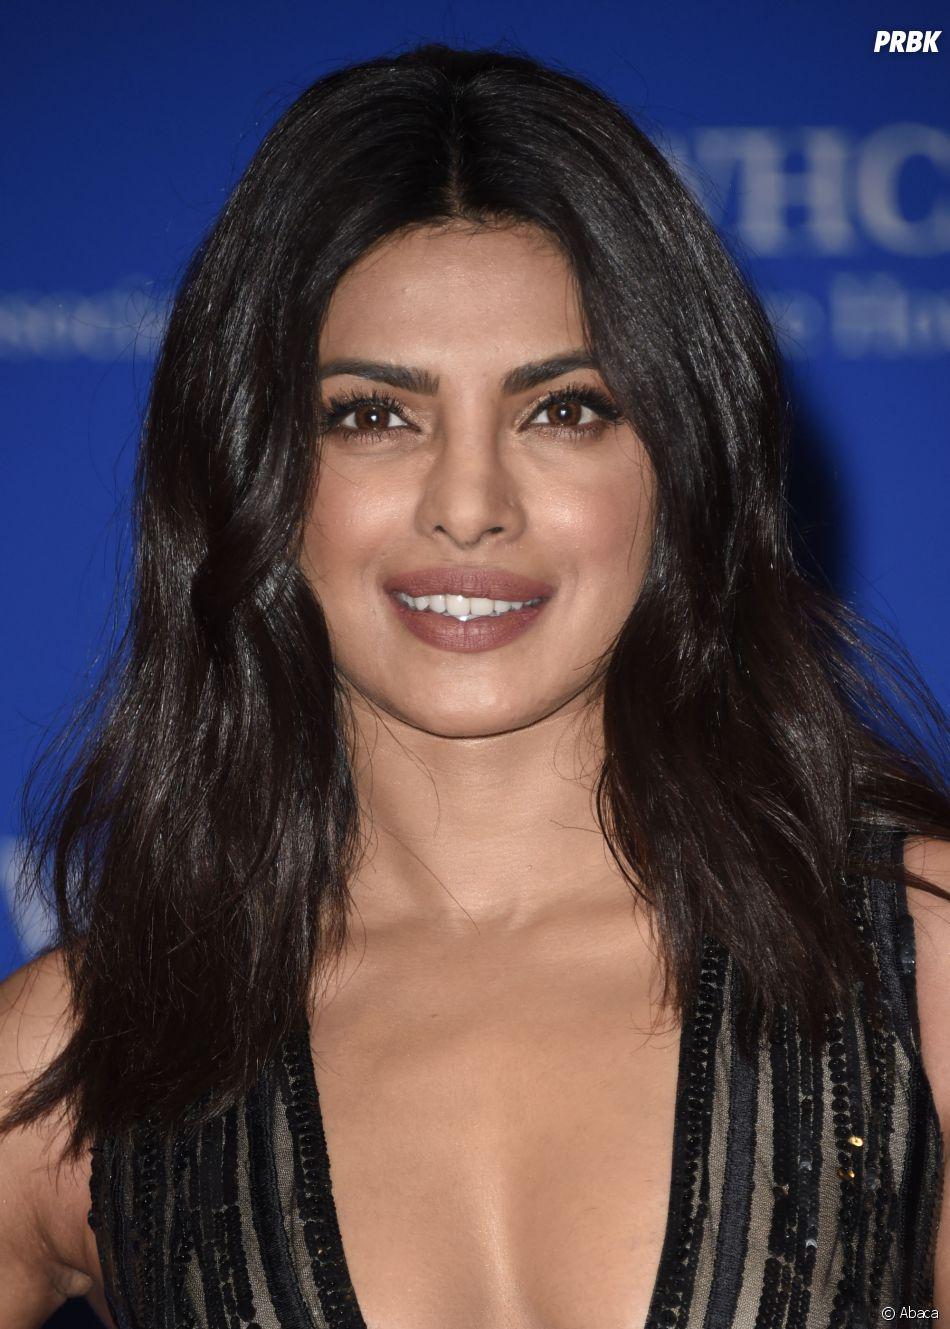 Priyanka Chopra (Quantico) : 11 000 000 millions de dollars